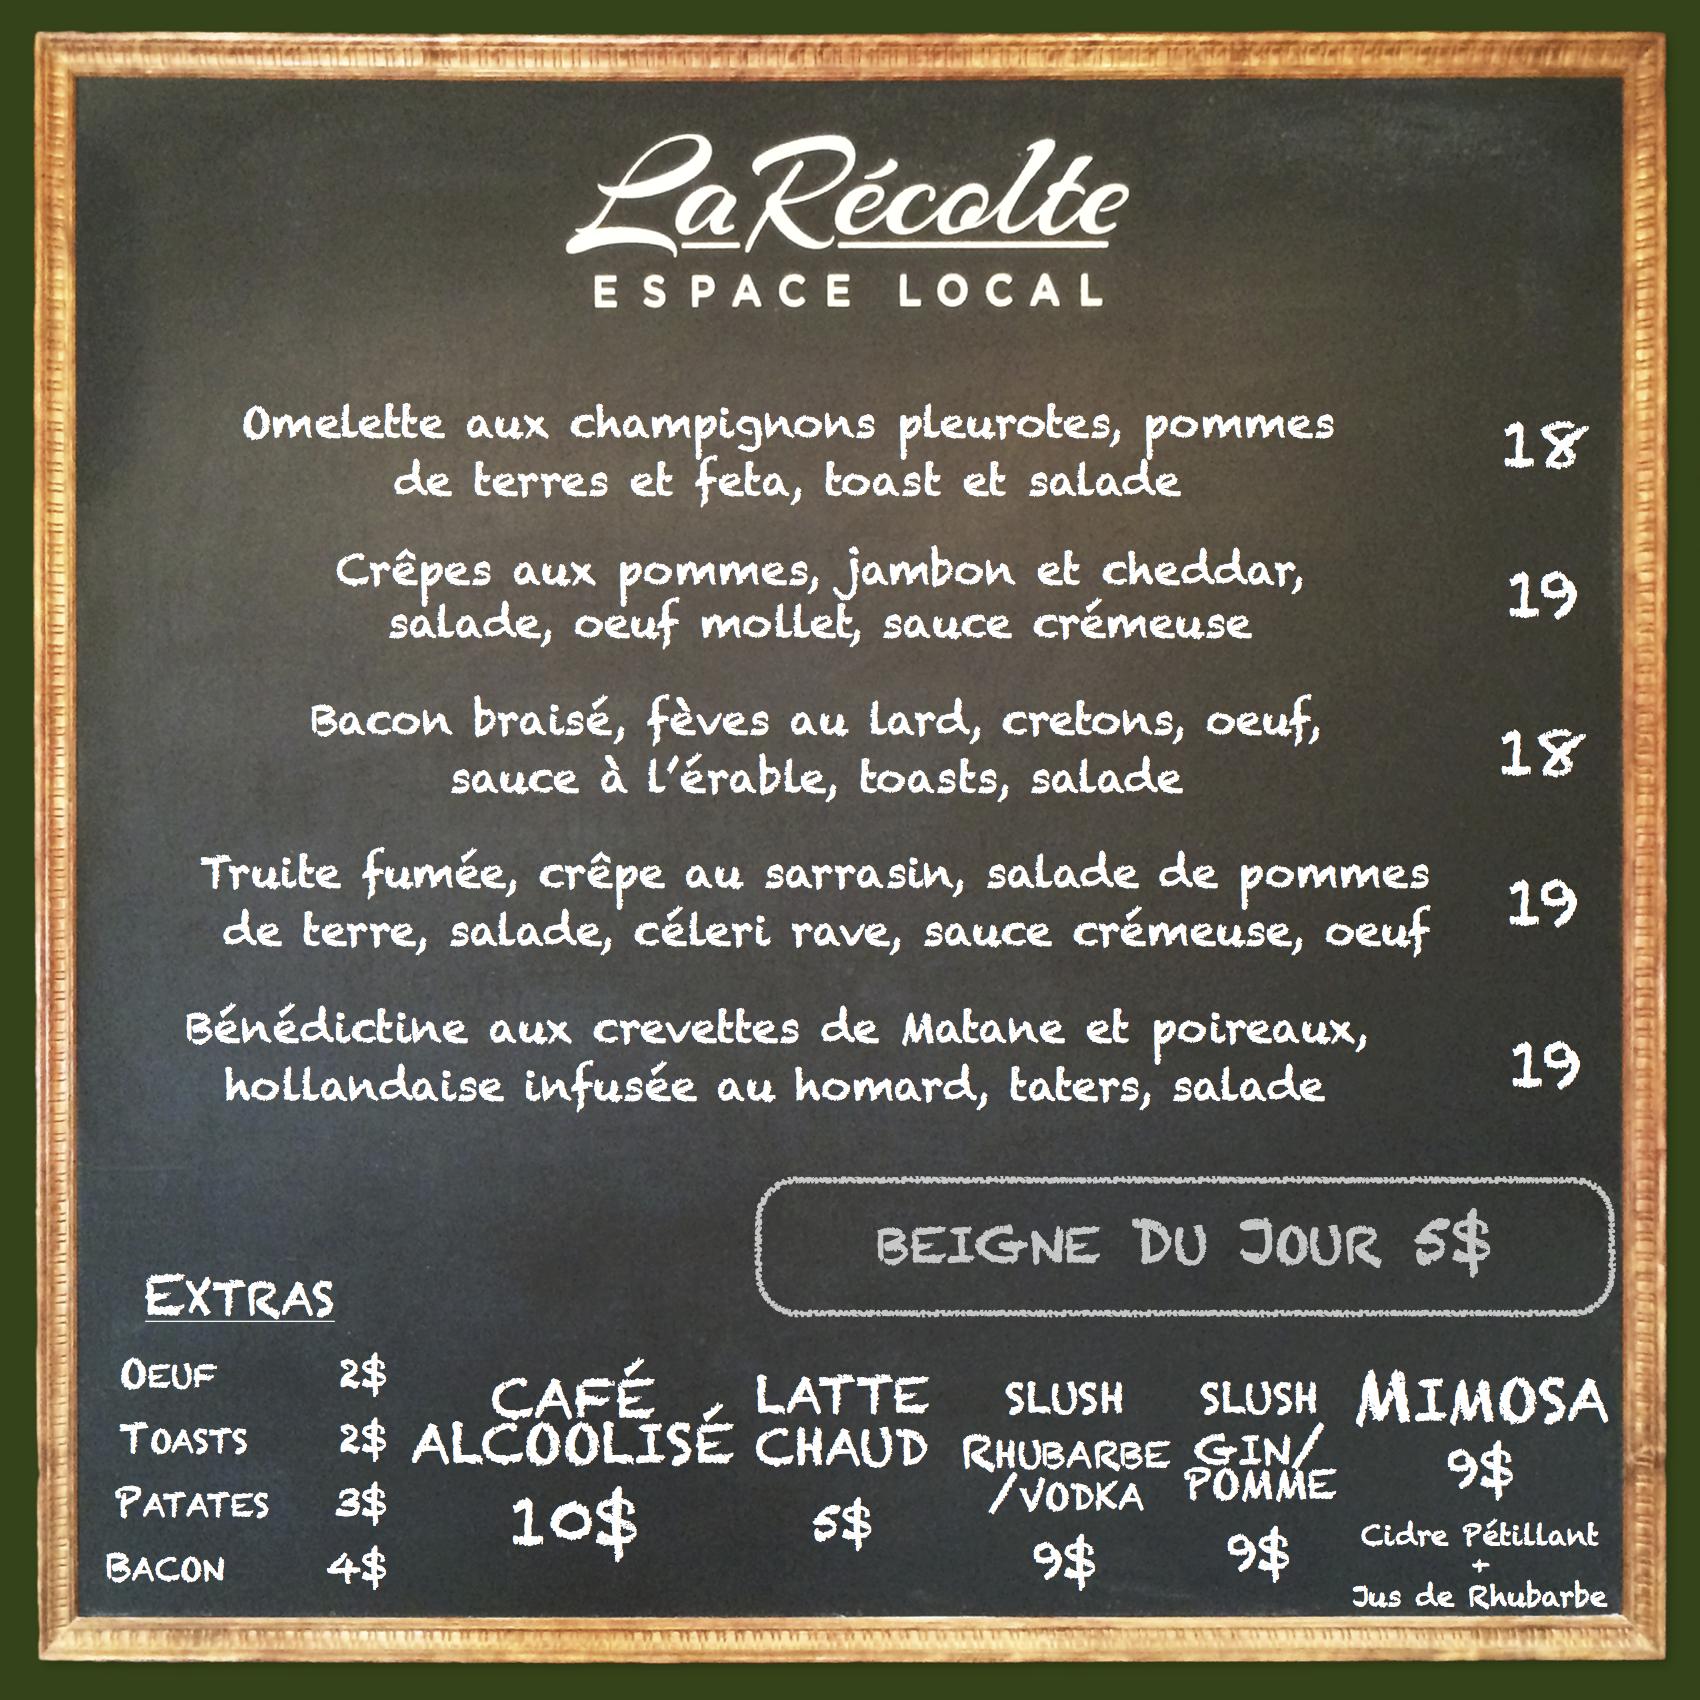 menu 30-1 avril, brunch loca bio montreal.png